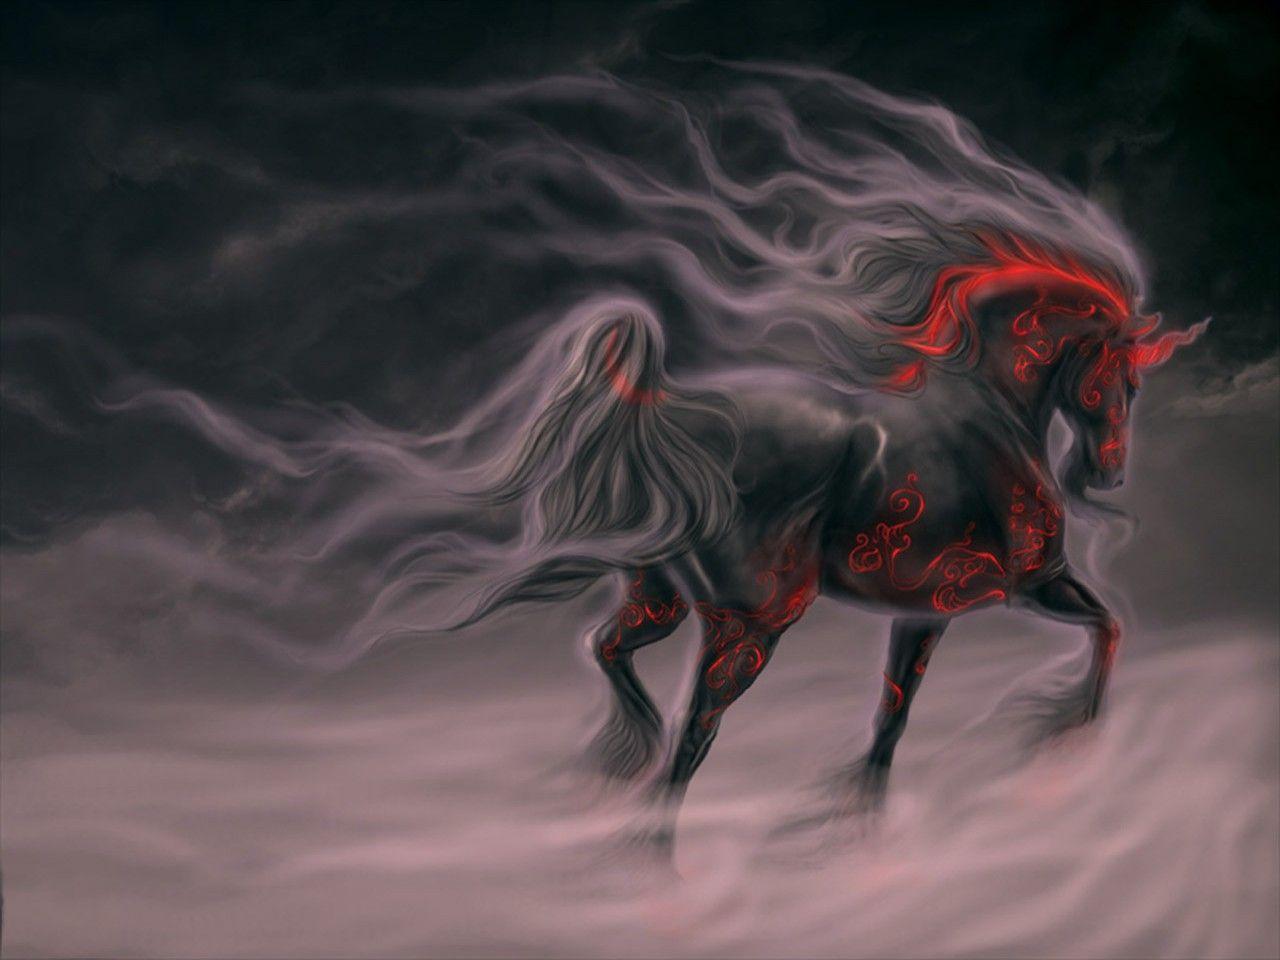 Awesome 3d Horse Wallpaper Image Wallpaper Caballo De La Muerte 142006 Hd Wallpaper Backgrounds Download